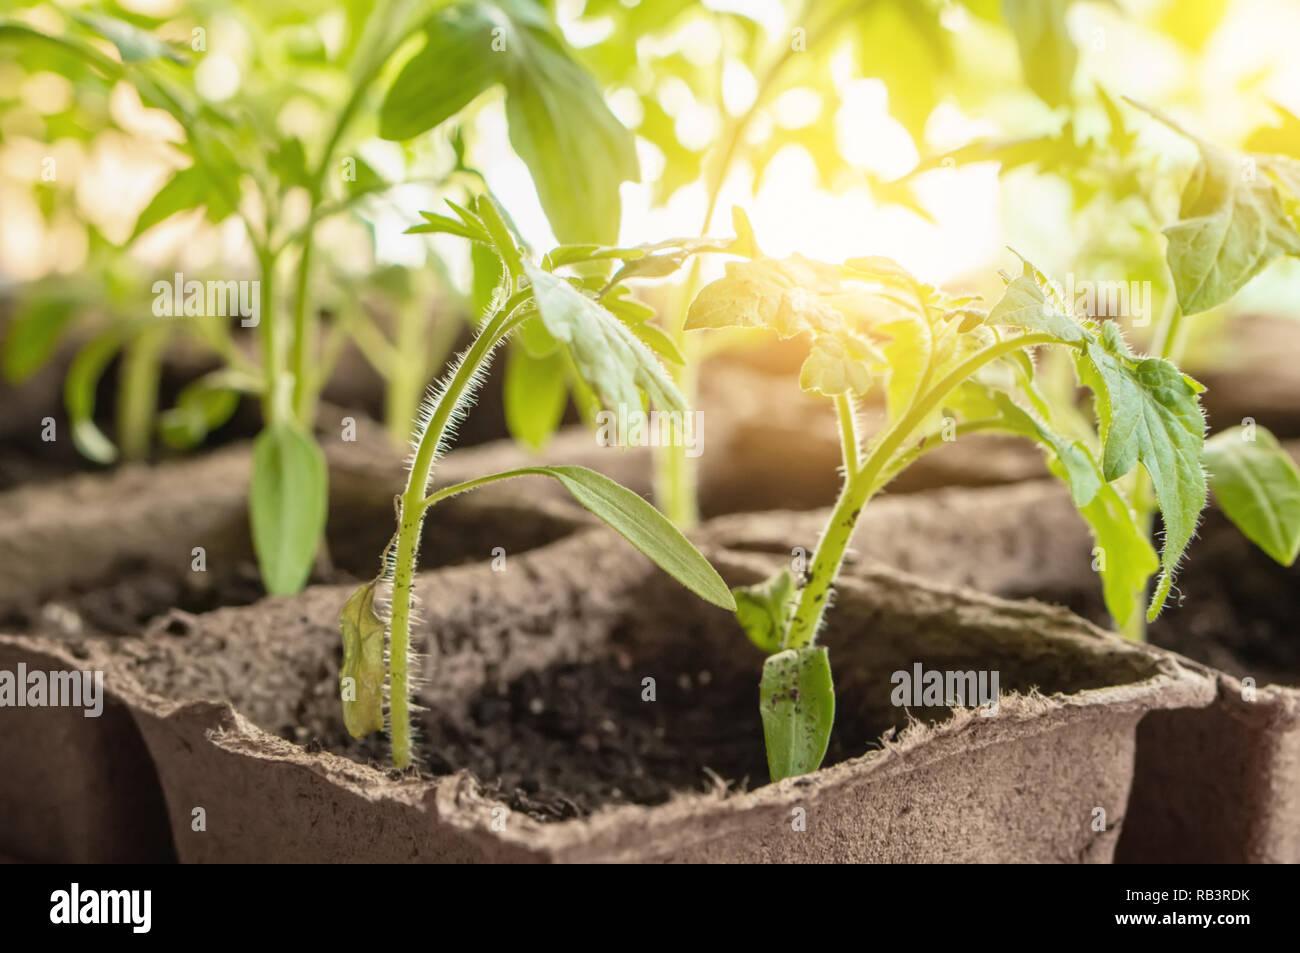 Growing tomato seedlings on the windowsill in peat pots Stock Photo